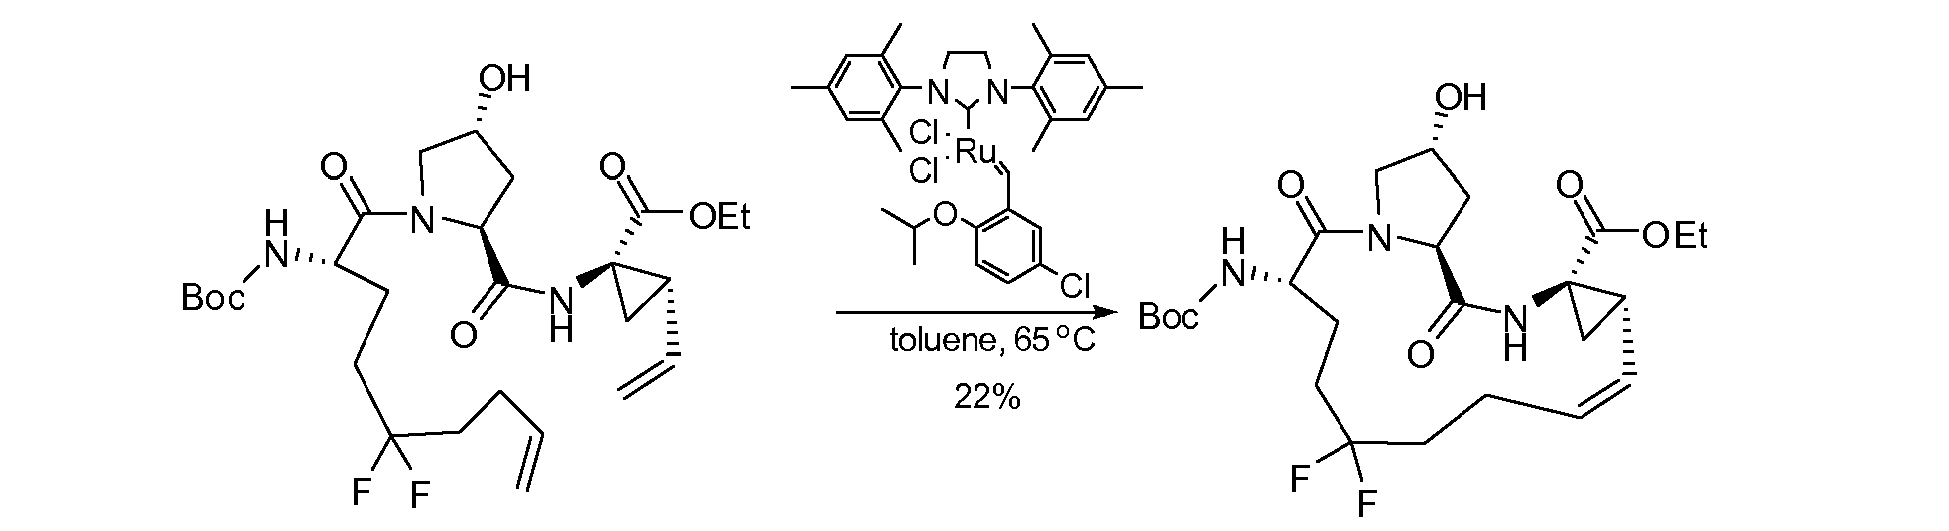 Figure imgb0525